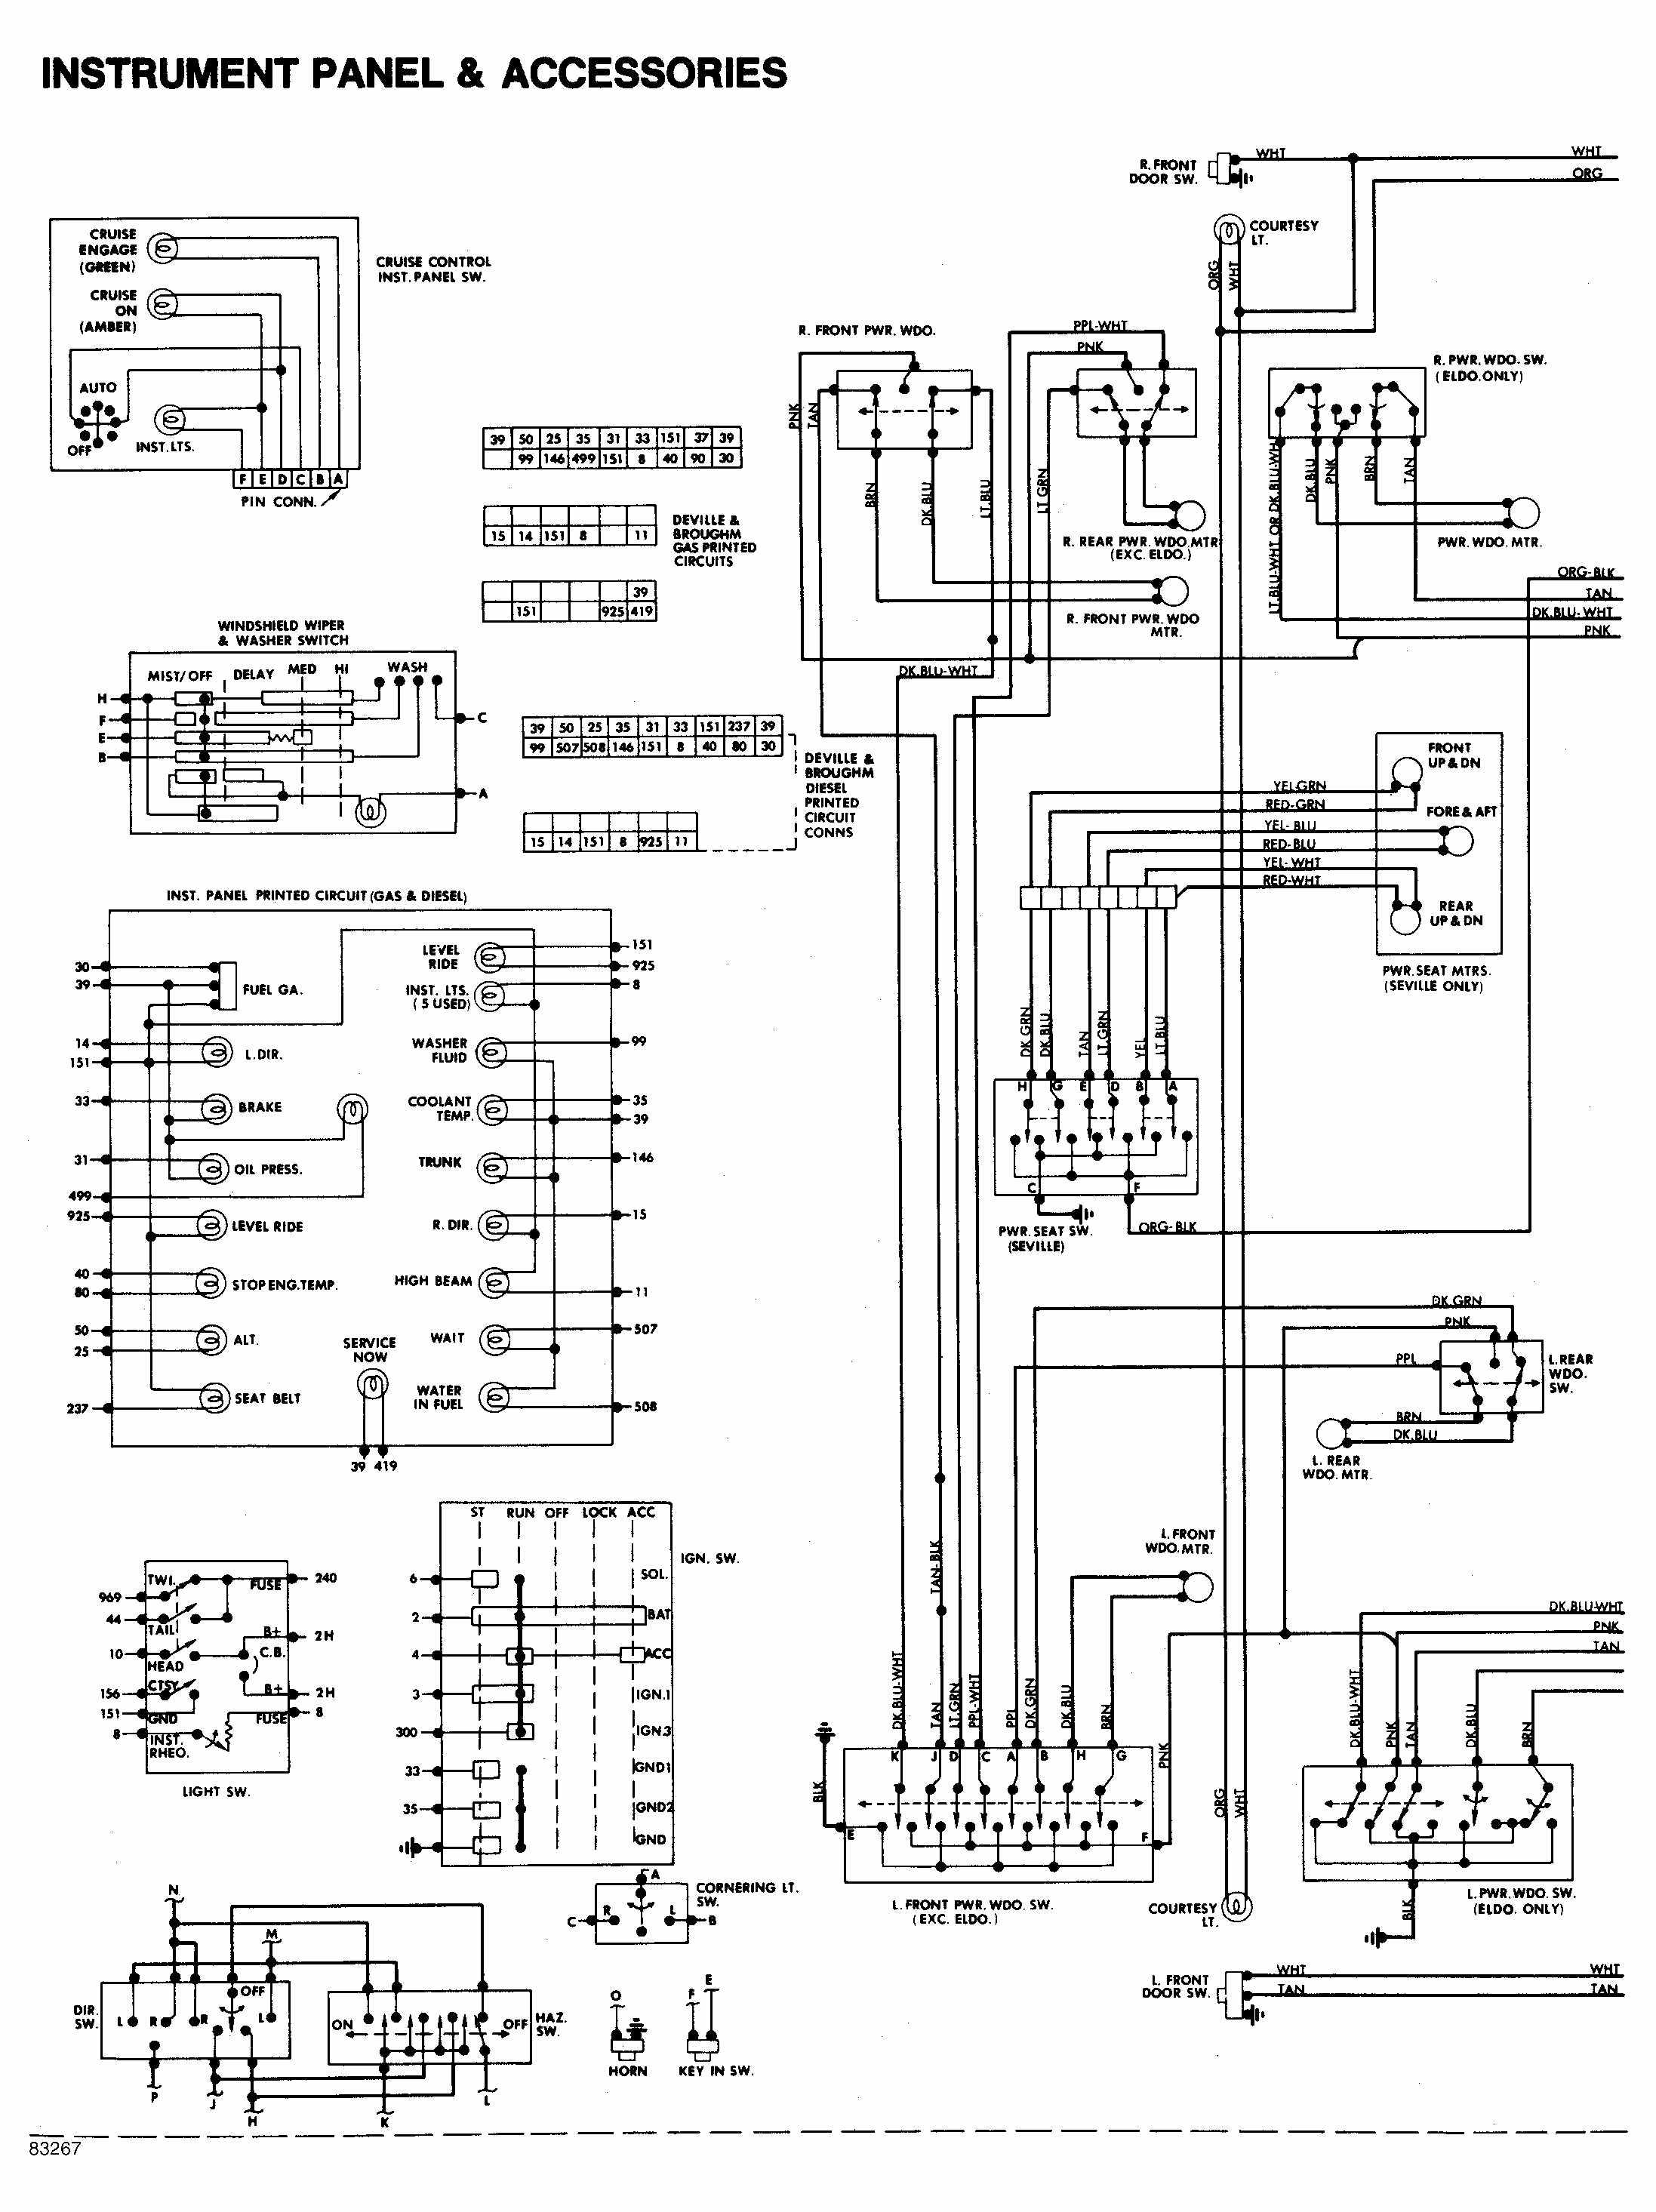 cadillac wiring schematics wiring diagrams clicks rh election hirufm lk